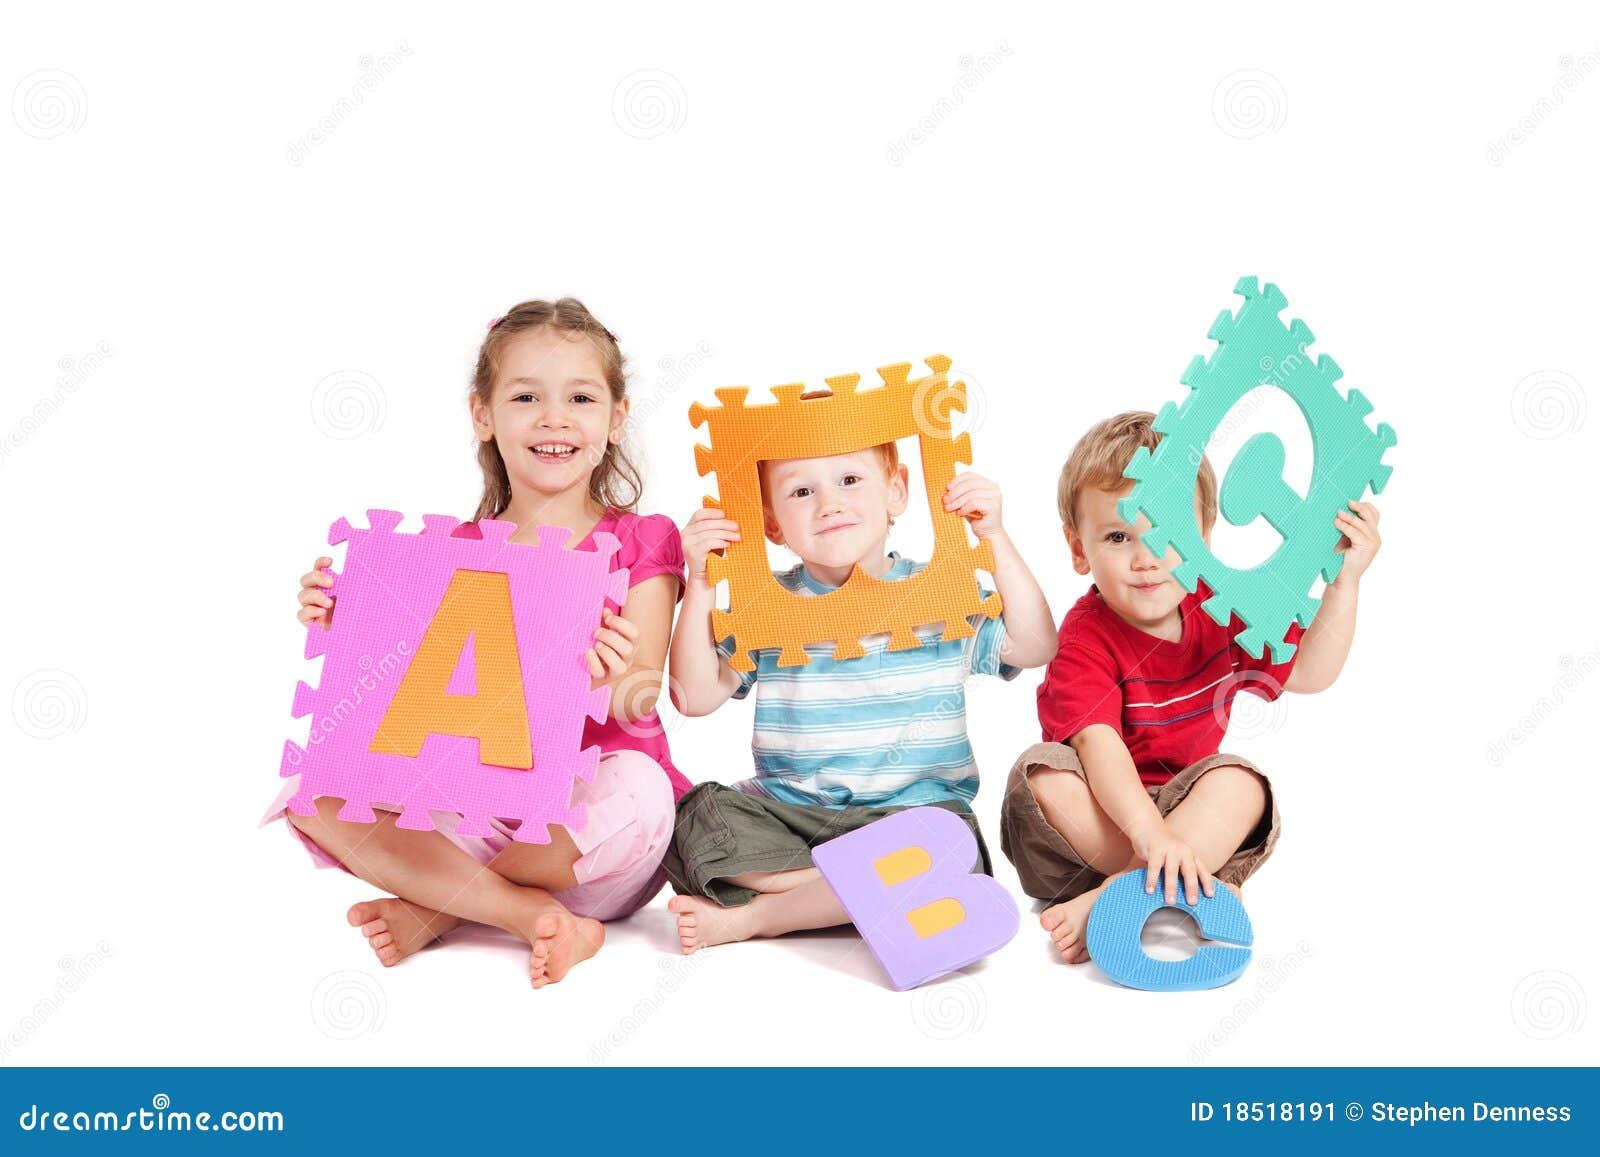 Abc字母表儿童了解信函的乐趣孩子